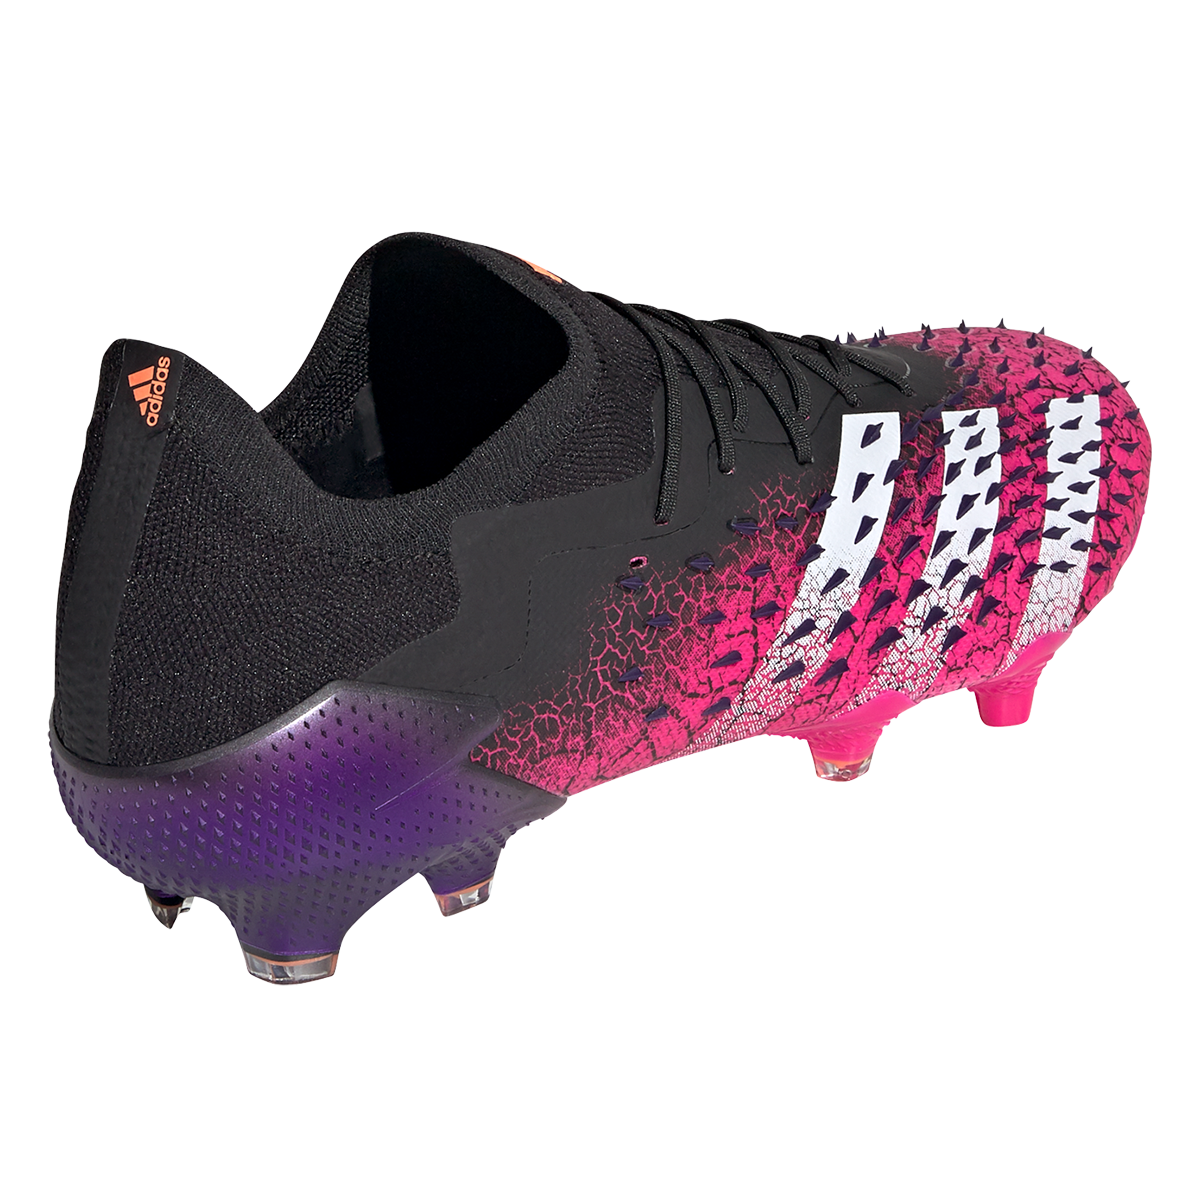 Chaussure de football adidas Predator Freak .1 L FG noir / rose ...